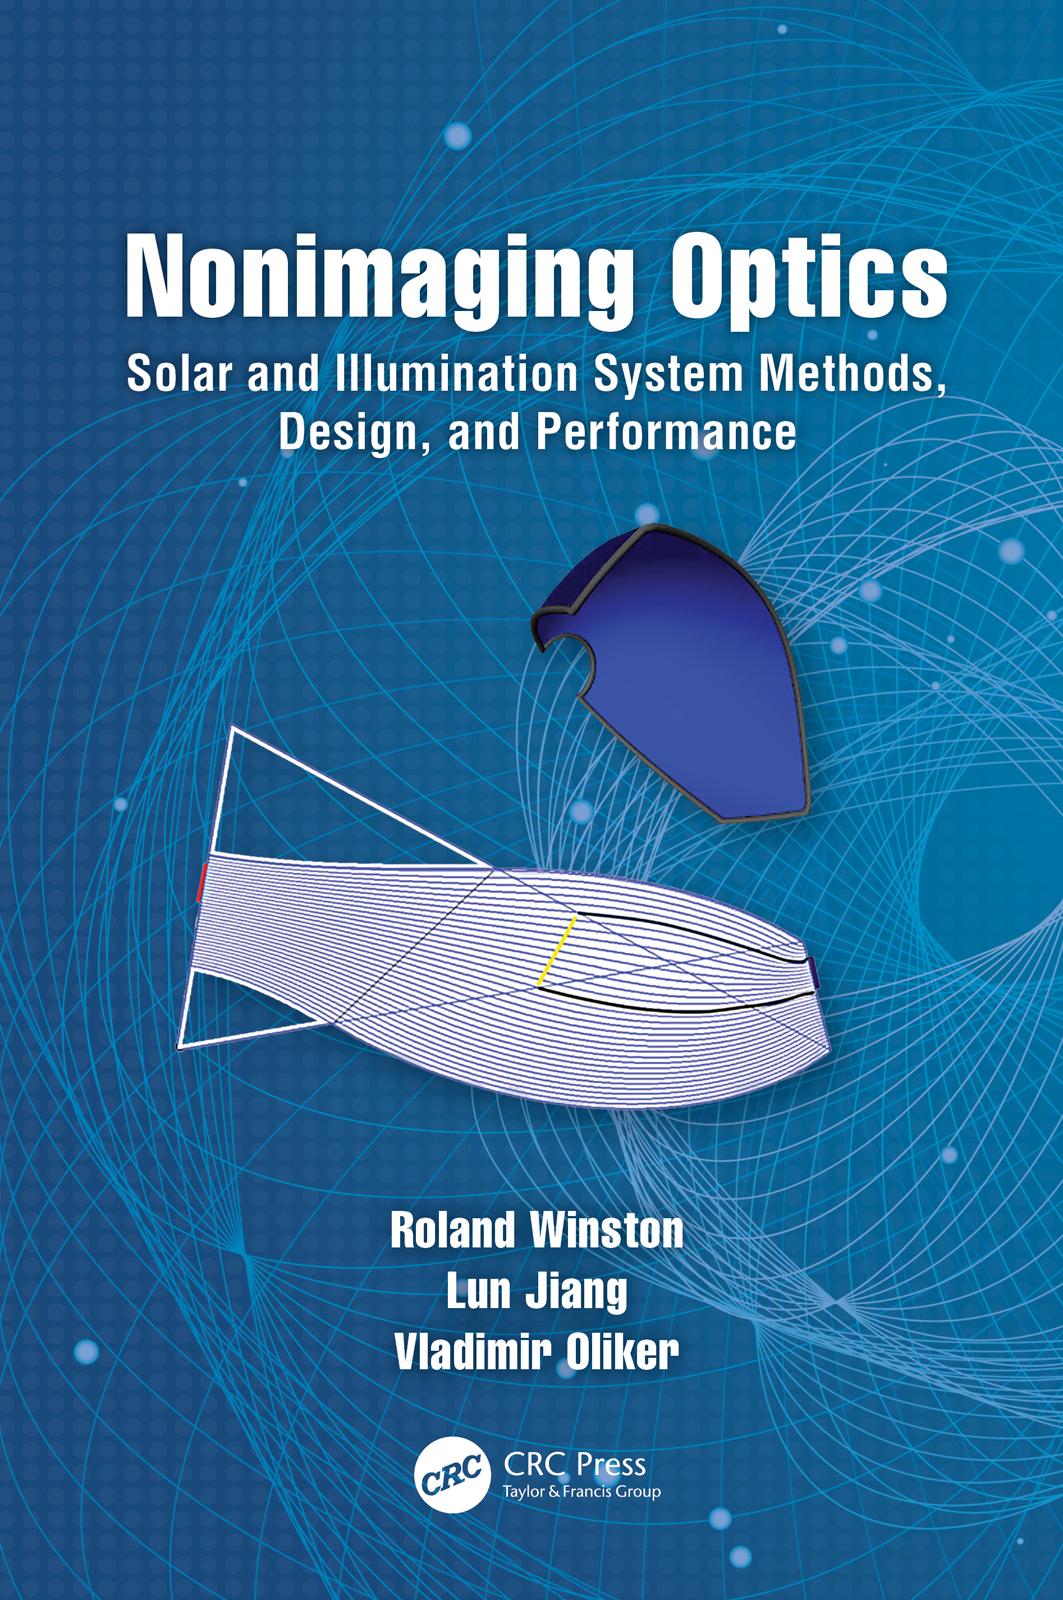 Freeform Optics and Supporting Quadric Method Introduction